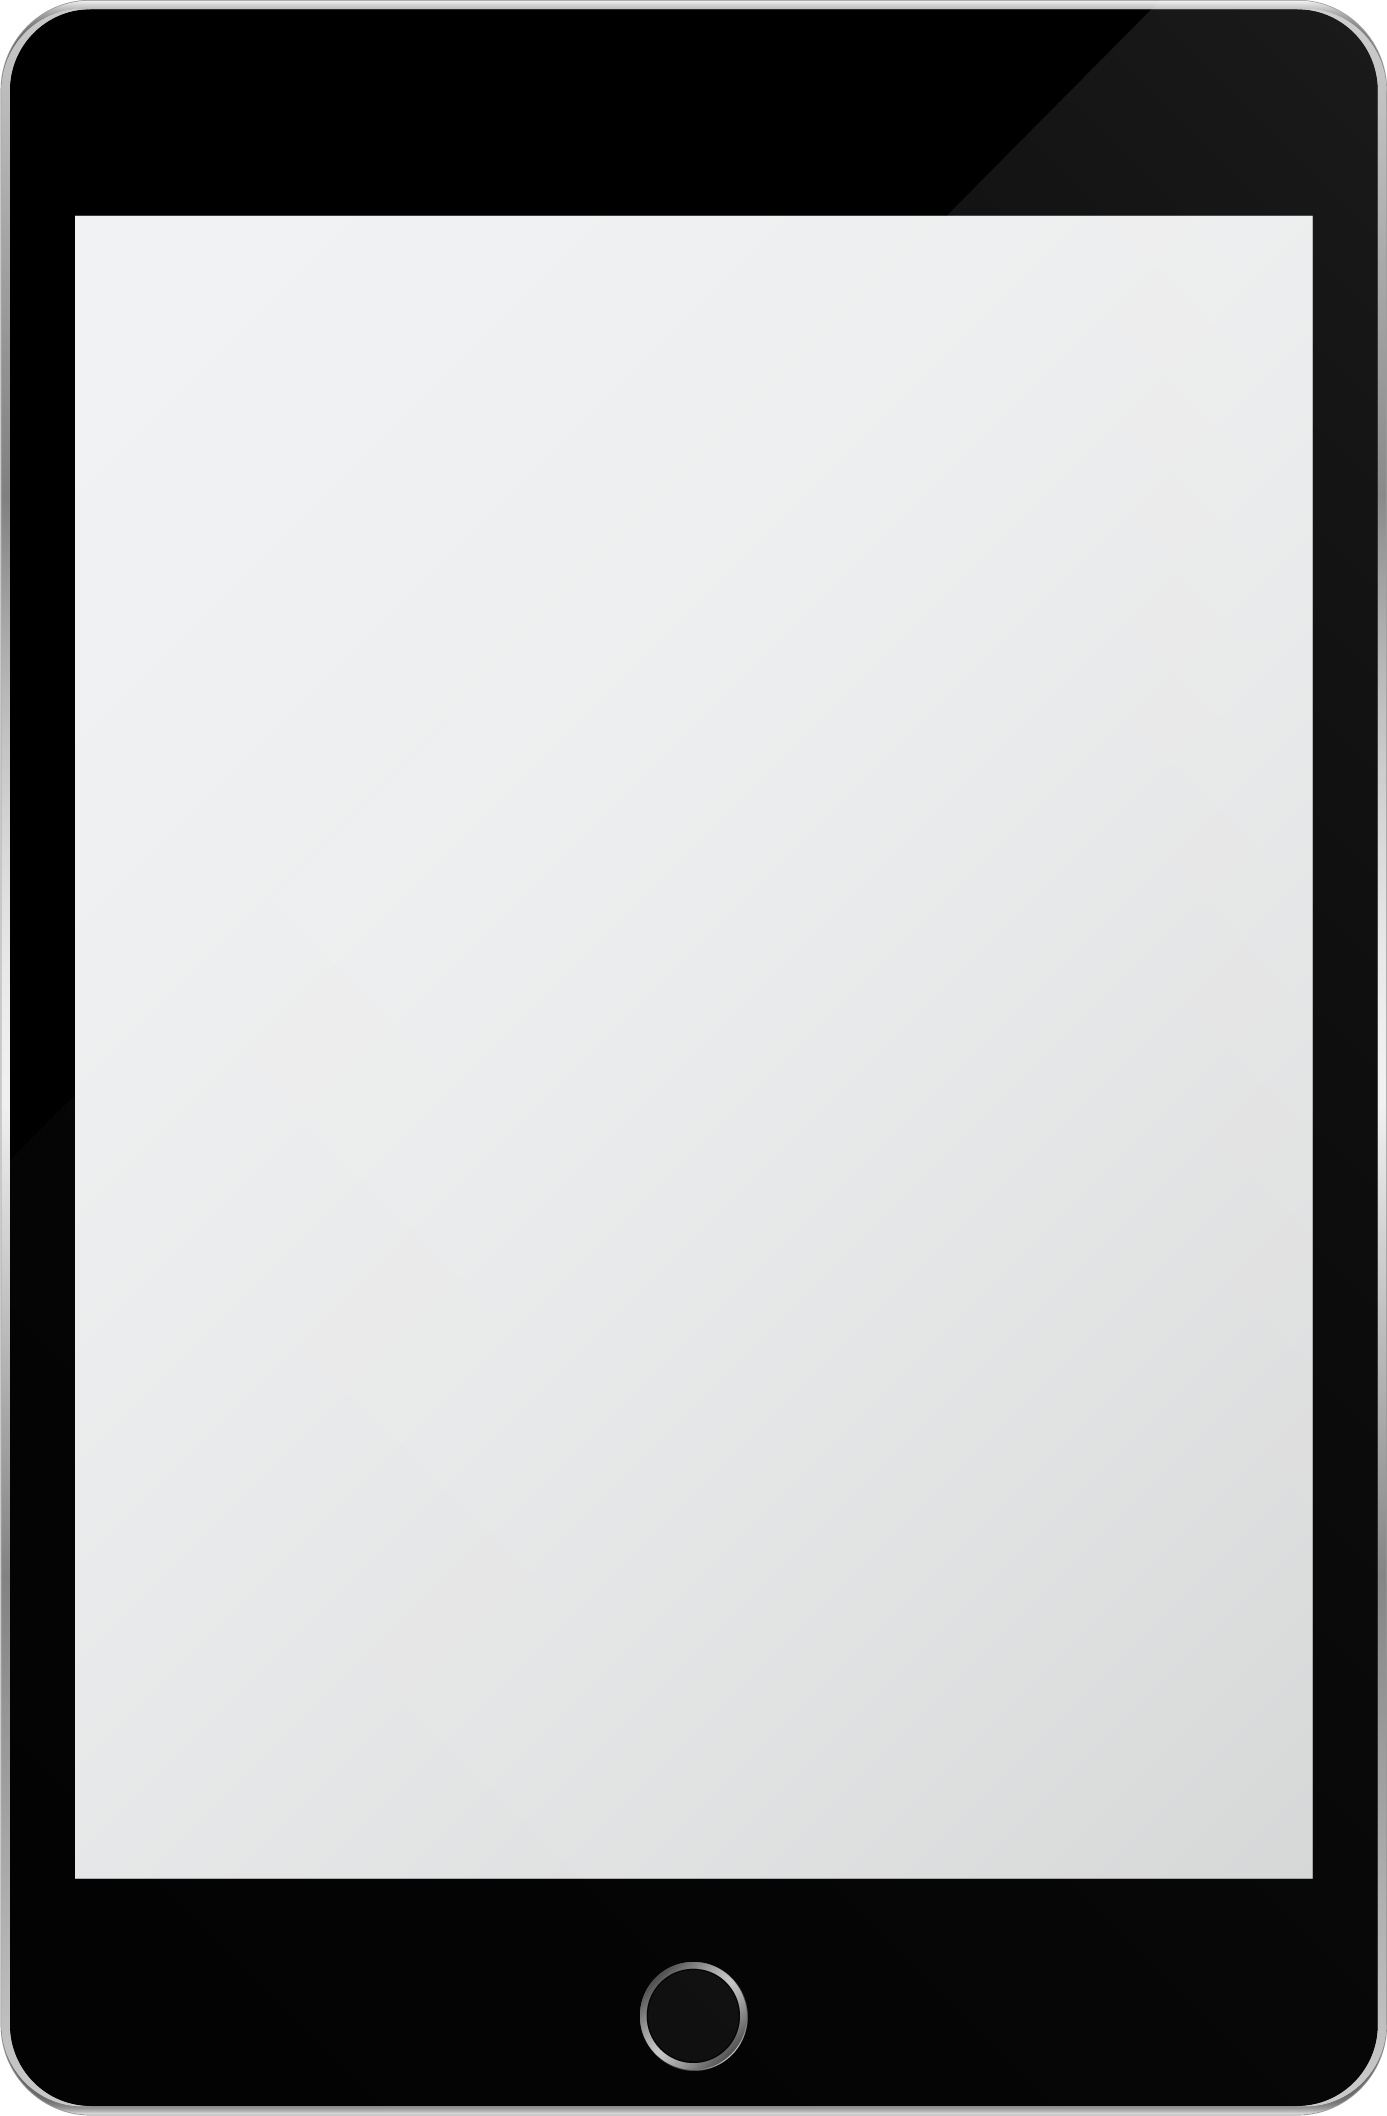 Plus tablet device